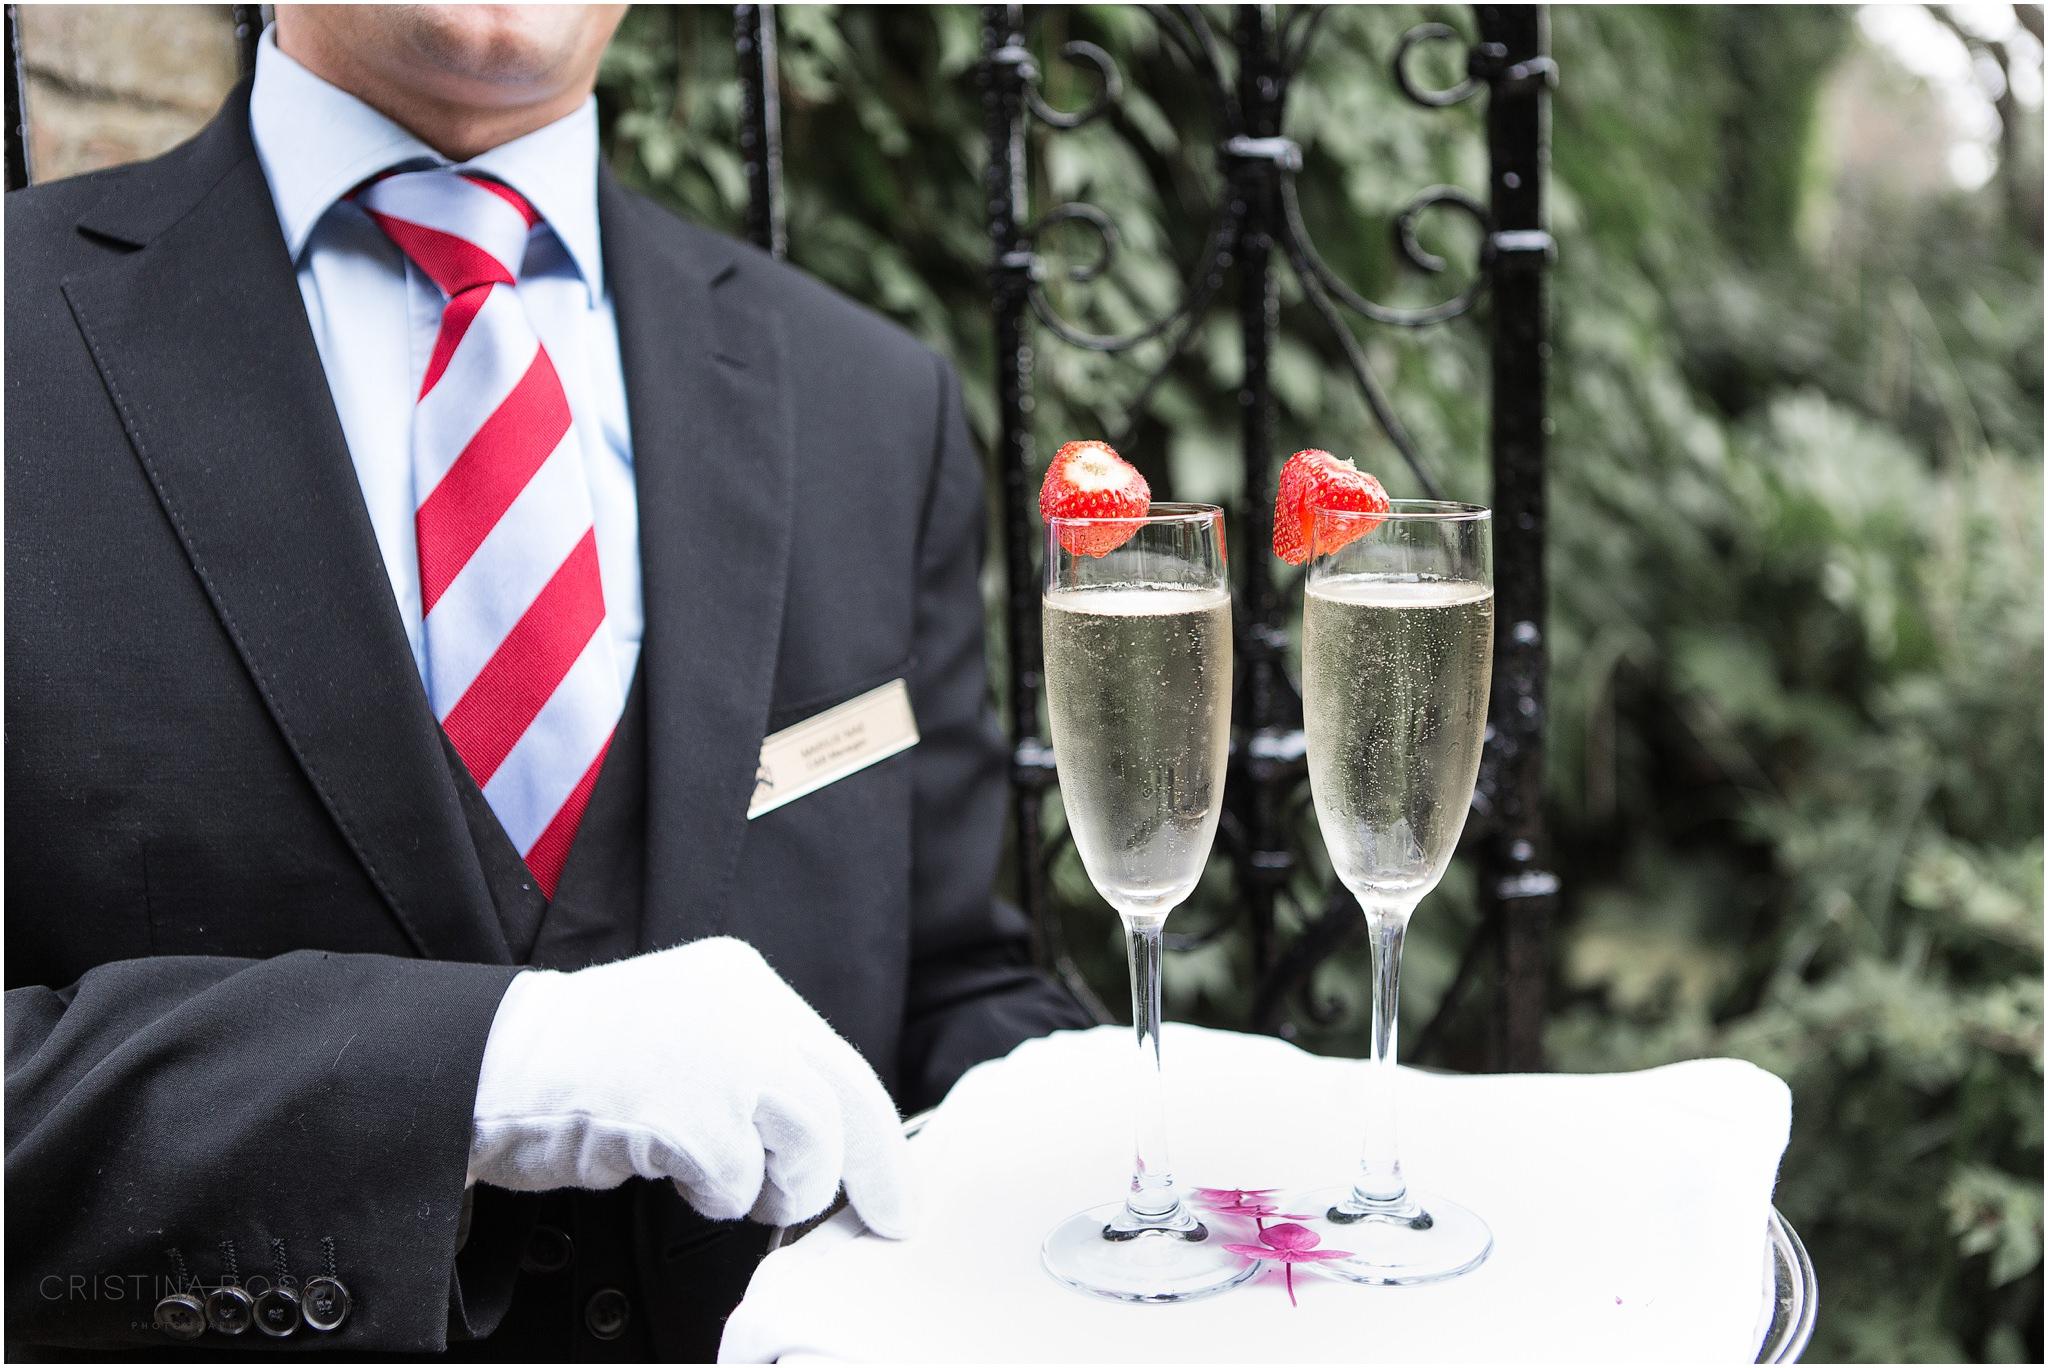 Eastwell Manor Neil Razor Ruddock & Leah Newman wedding_0088